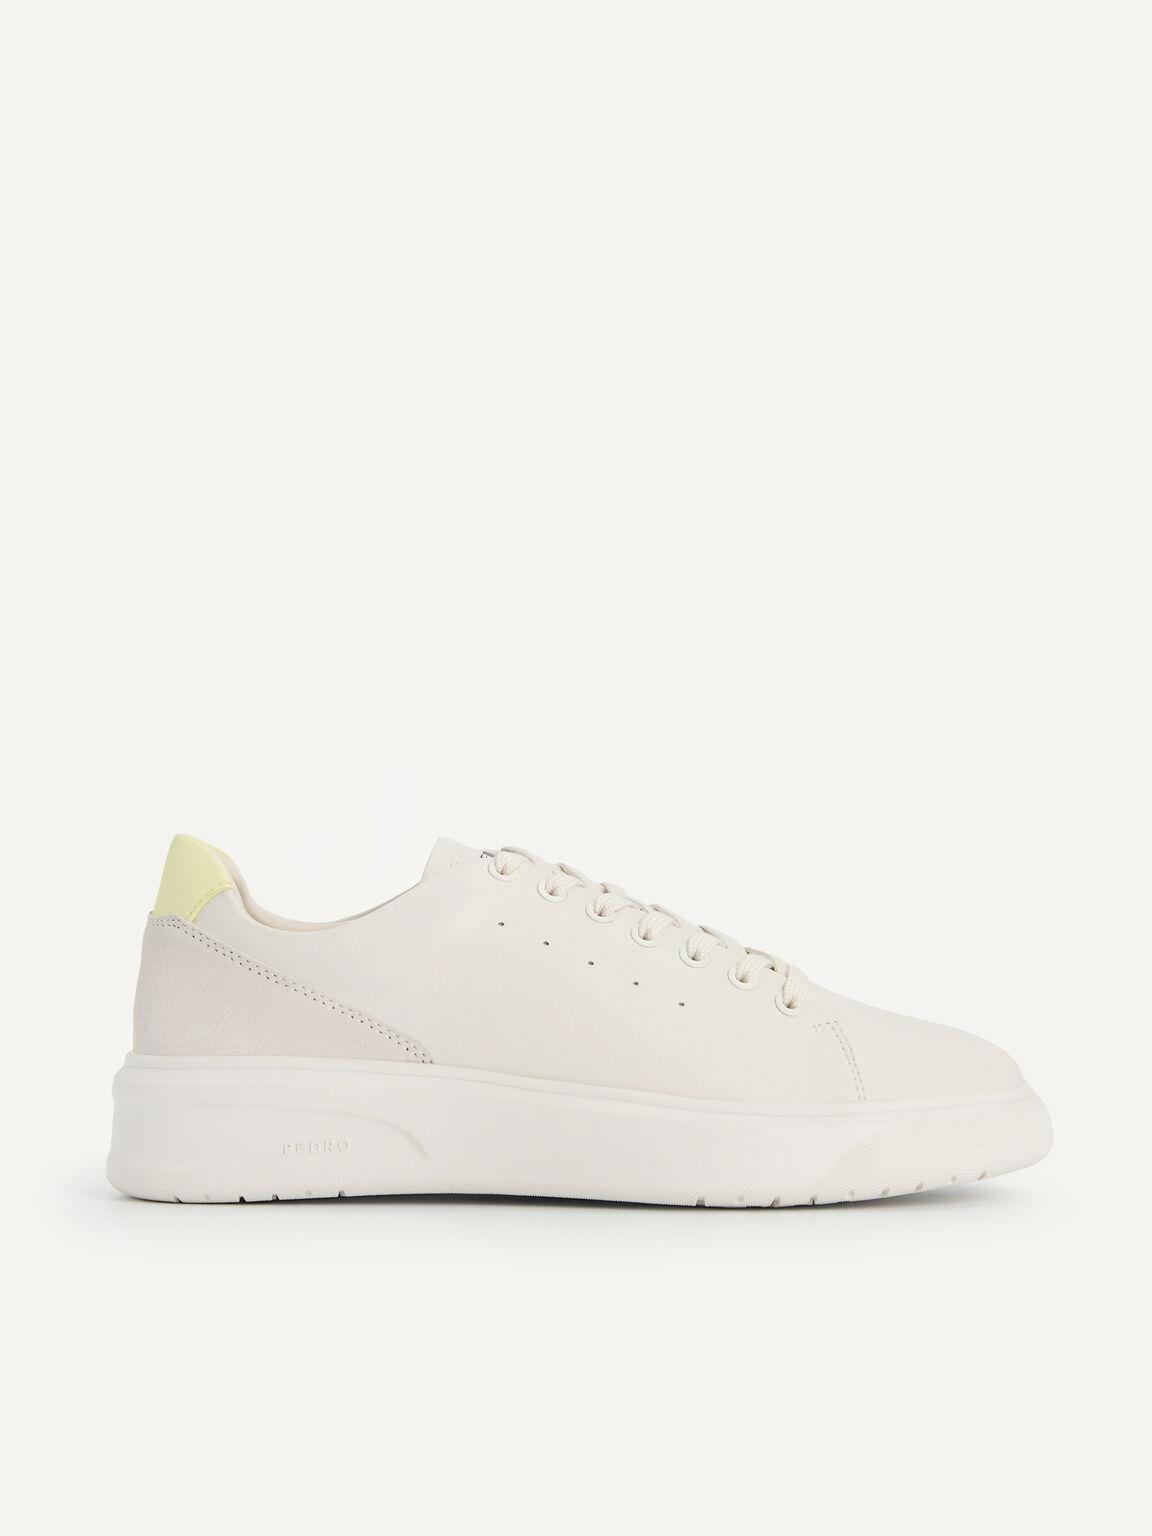 Dayflux Court Sneakers, Chalk, hi-res